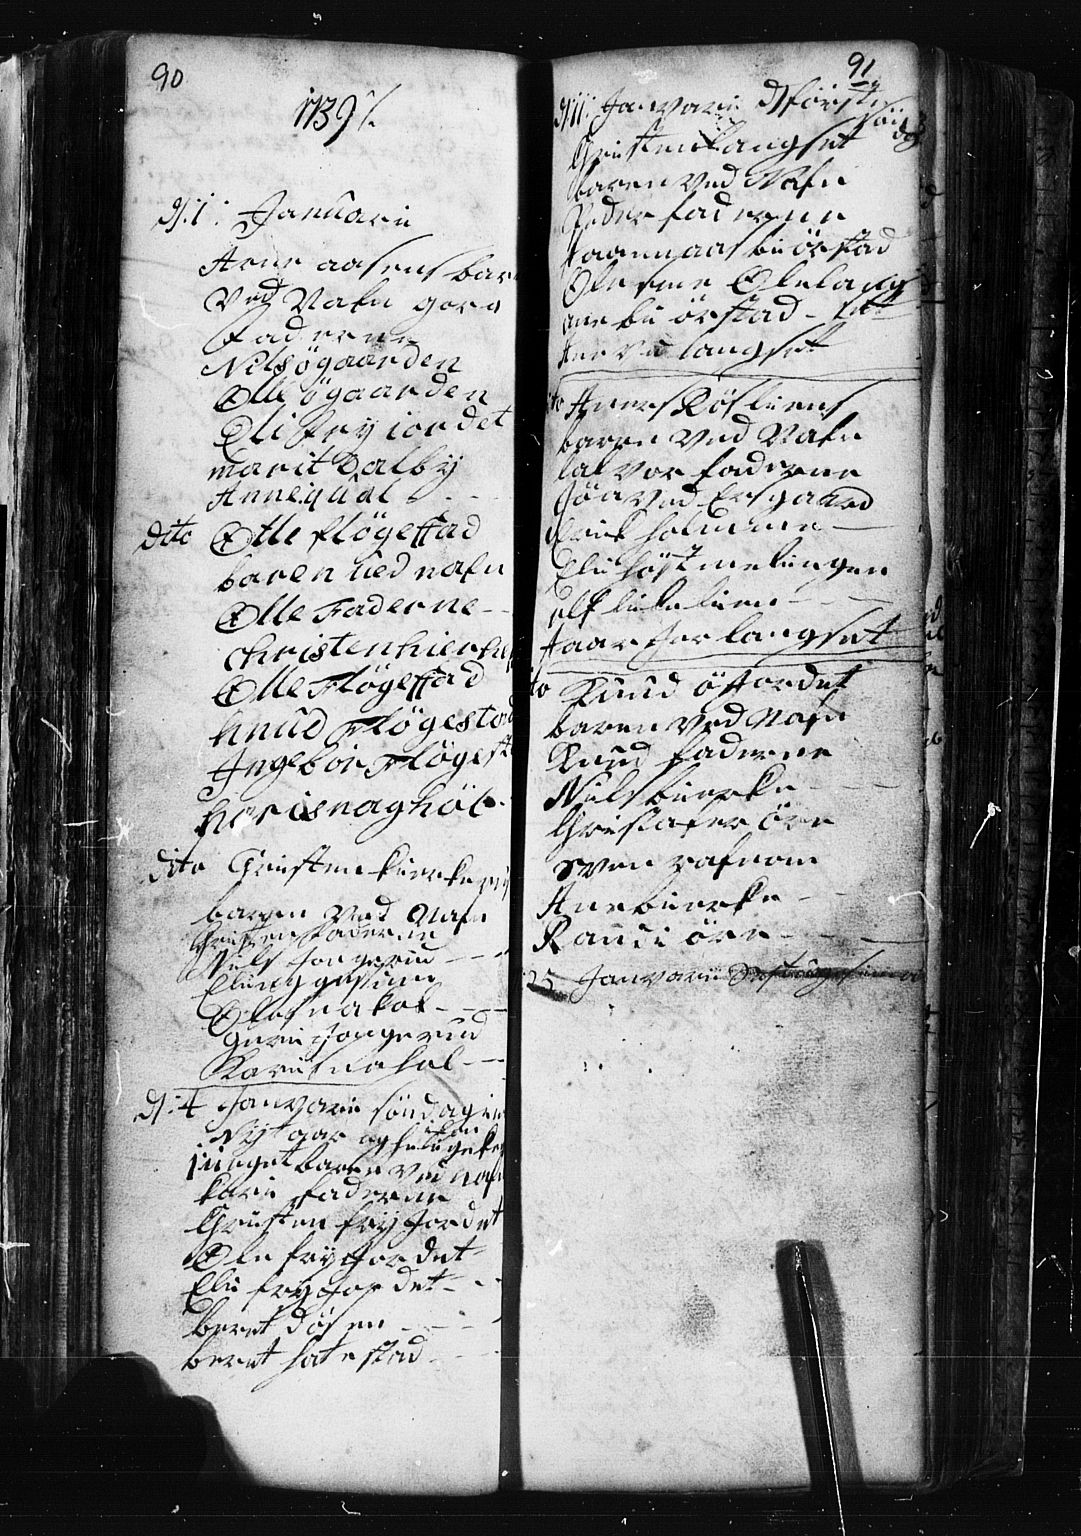 SAH, Fåberg prestekontor, Klokkerbok nr. 1, 1727-1767, s. 90-91